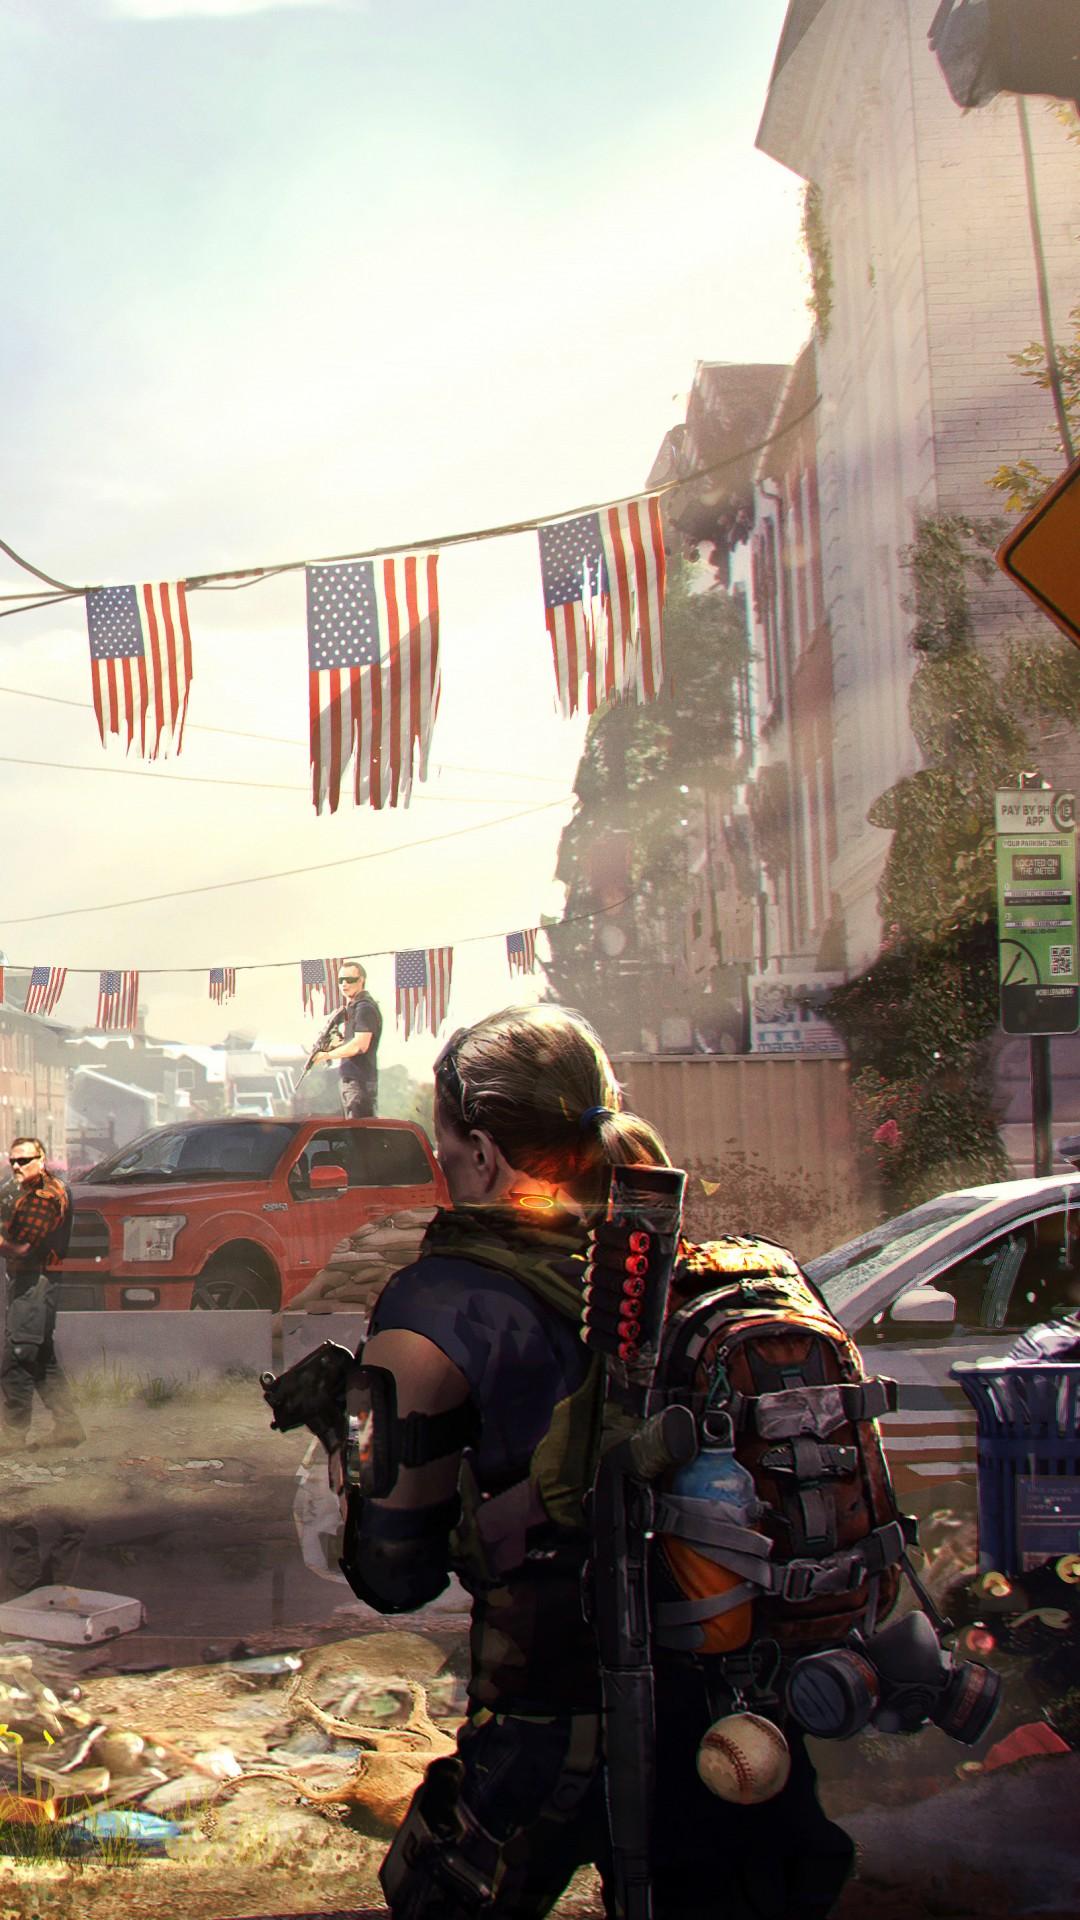 Wallpaper Tom Clancy S The Division 2 E3 2018 Artwork